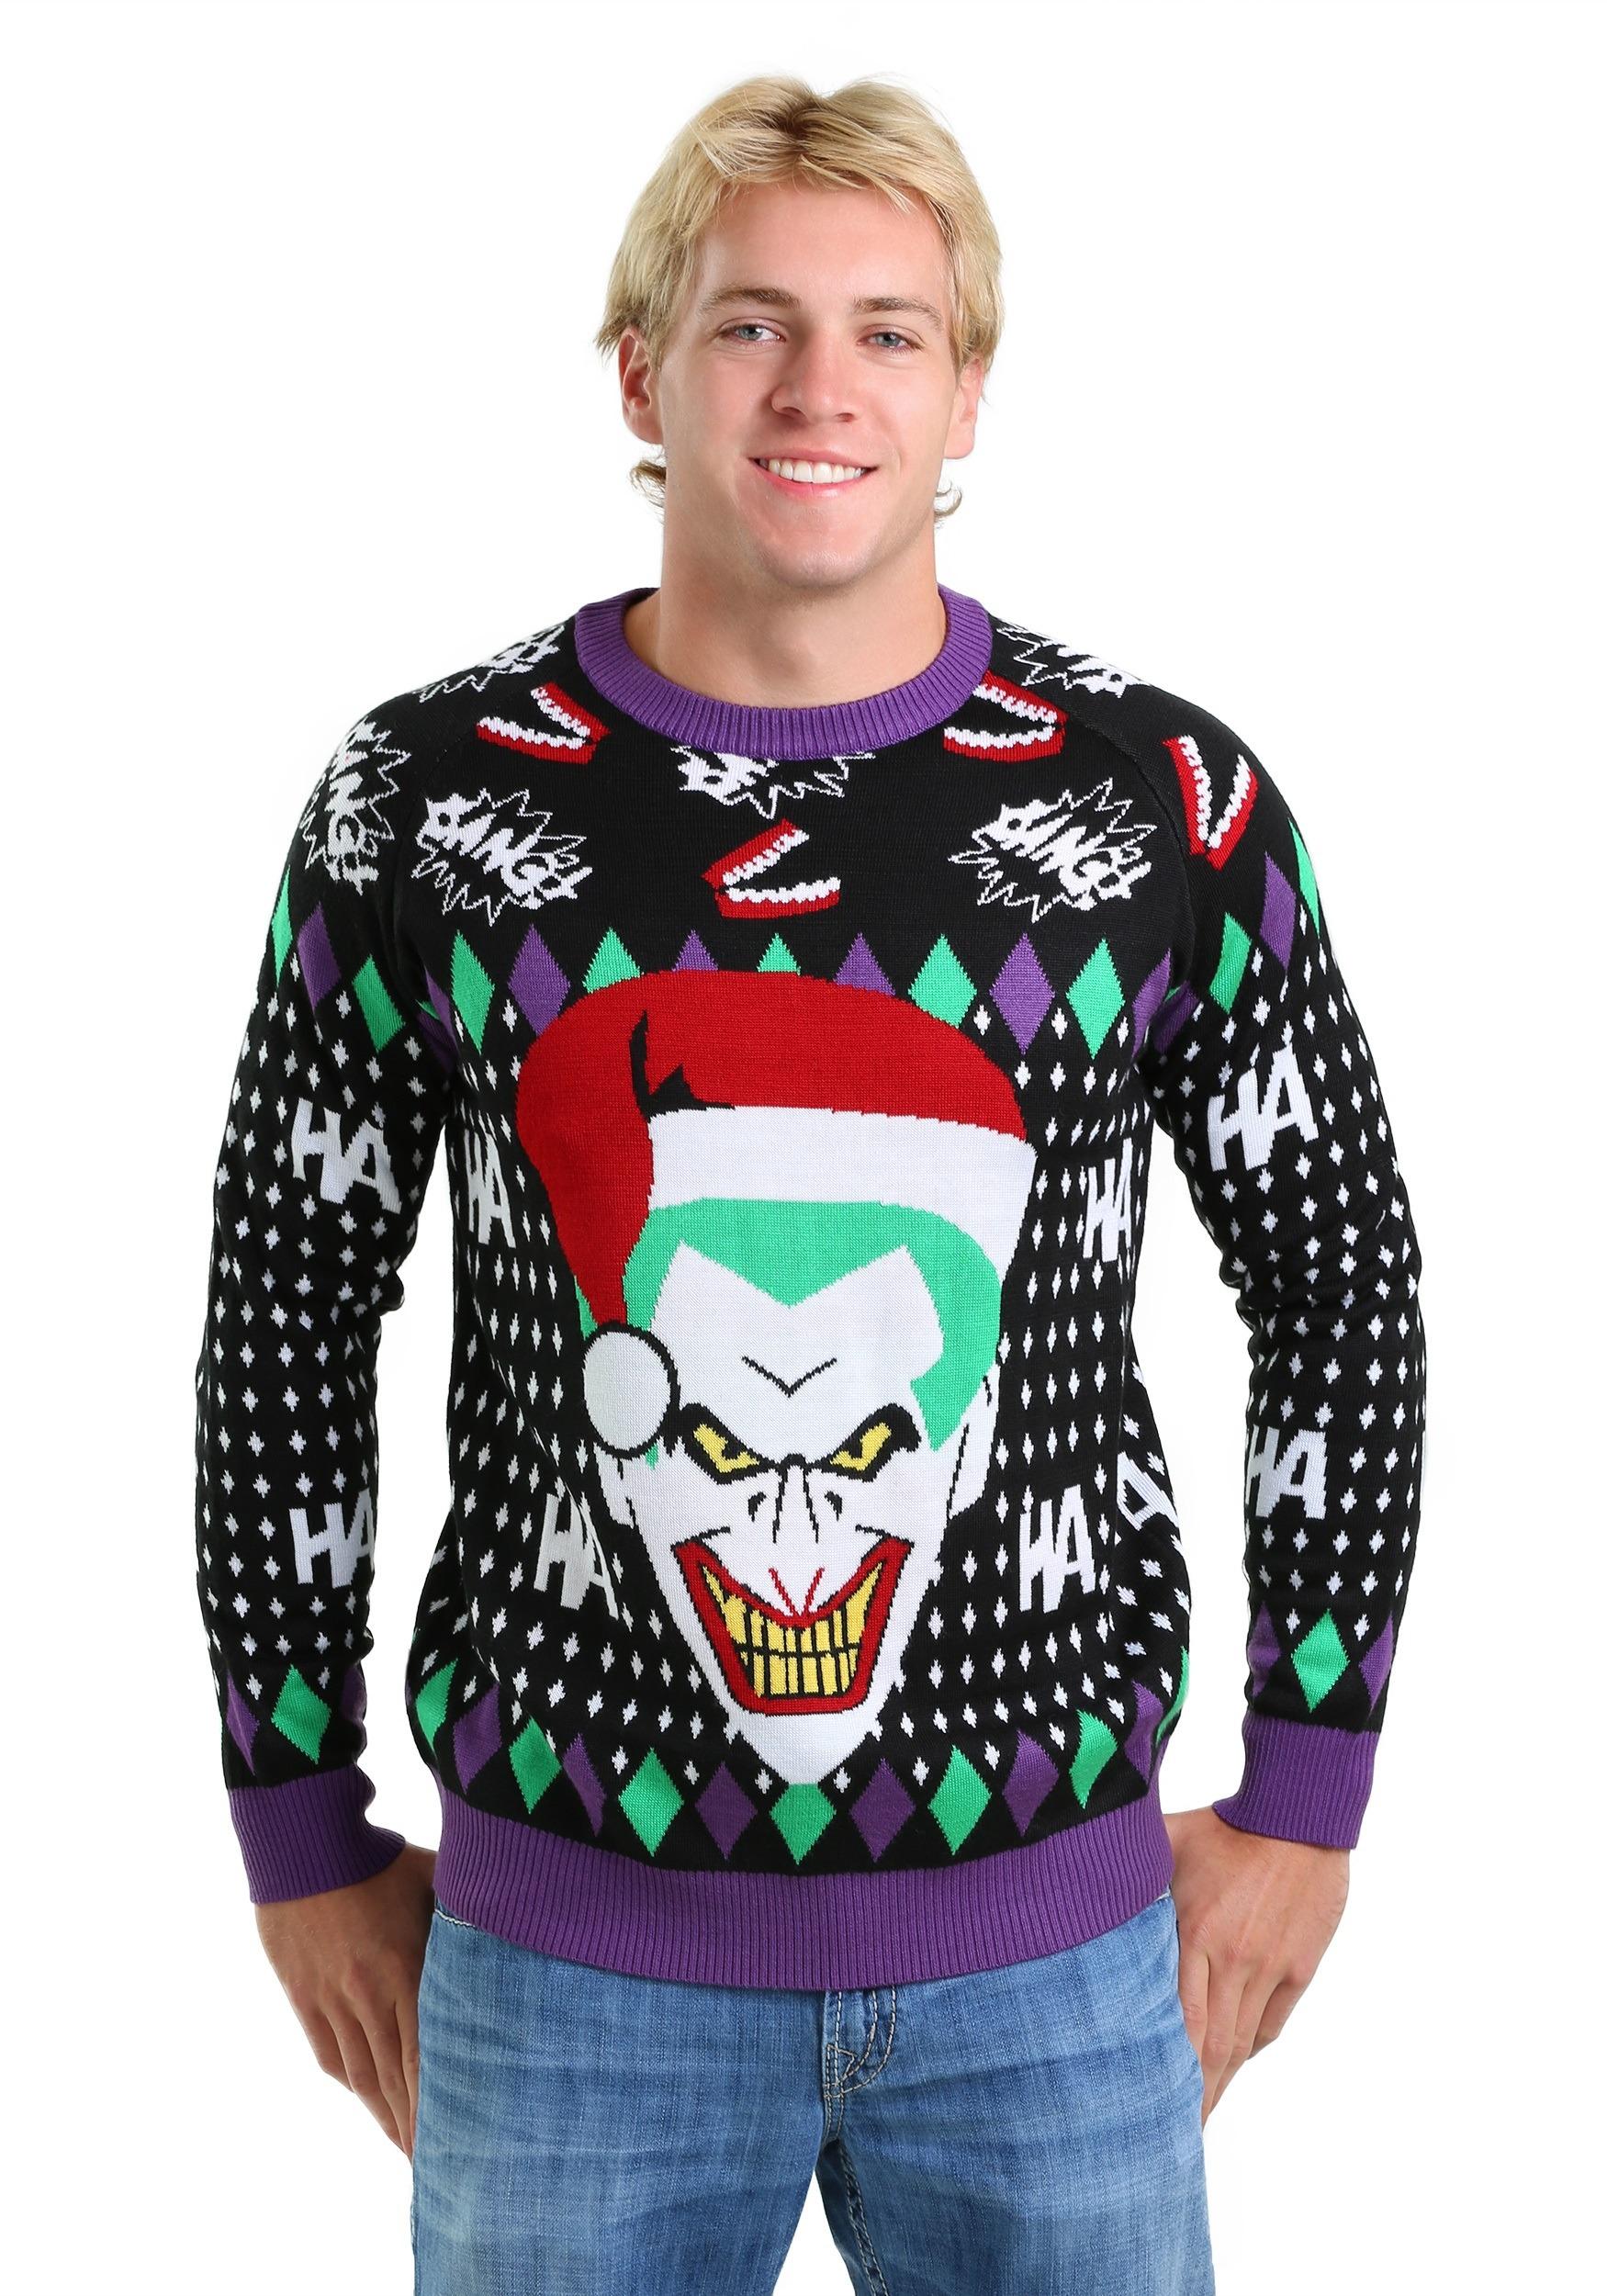 Joker Santa Ugly Christmas Sweater FUN9129